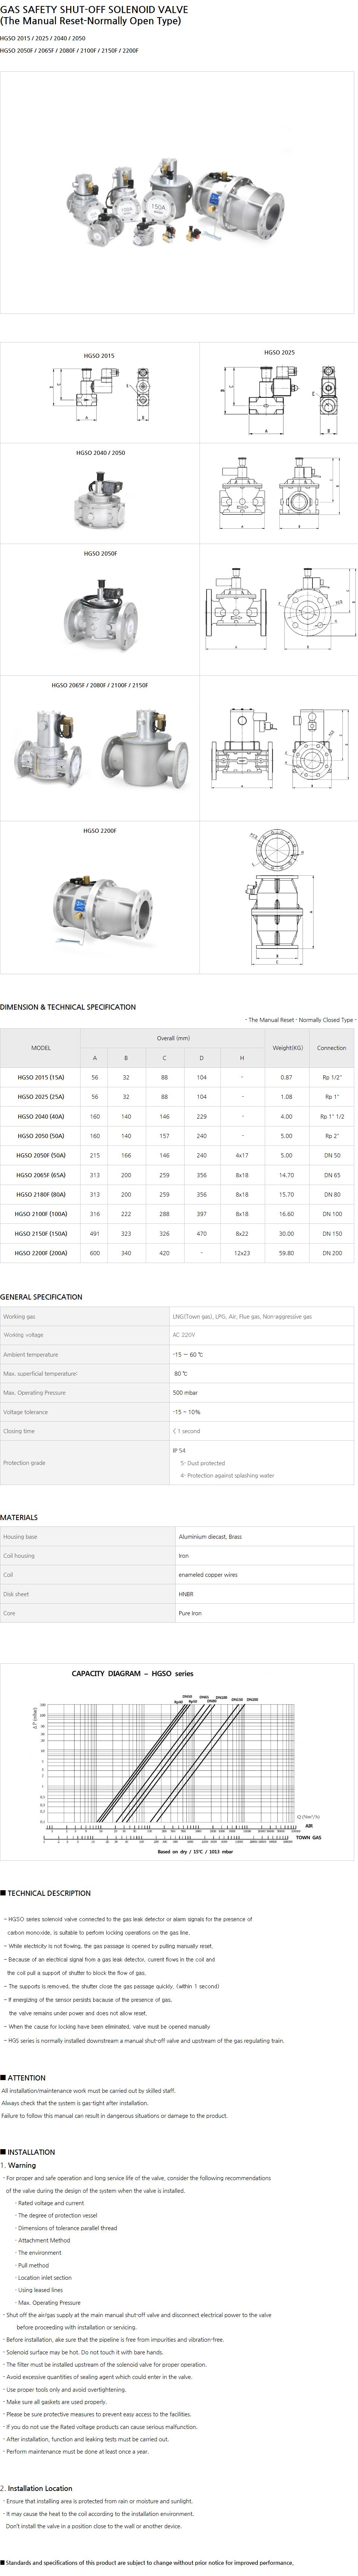 HYOSHIN MECHATRONICS Gas Safety Shut-off Solenoid Valve (Manual Reset)